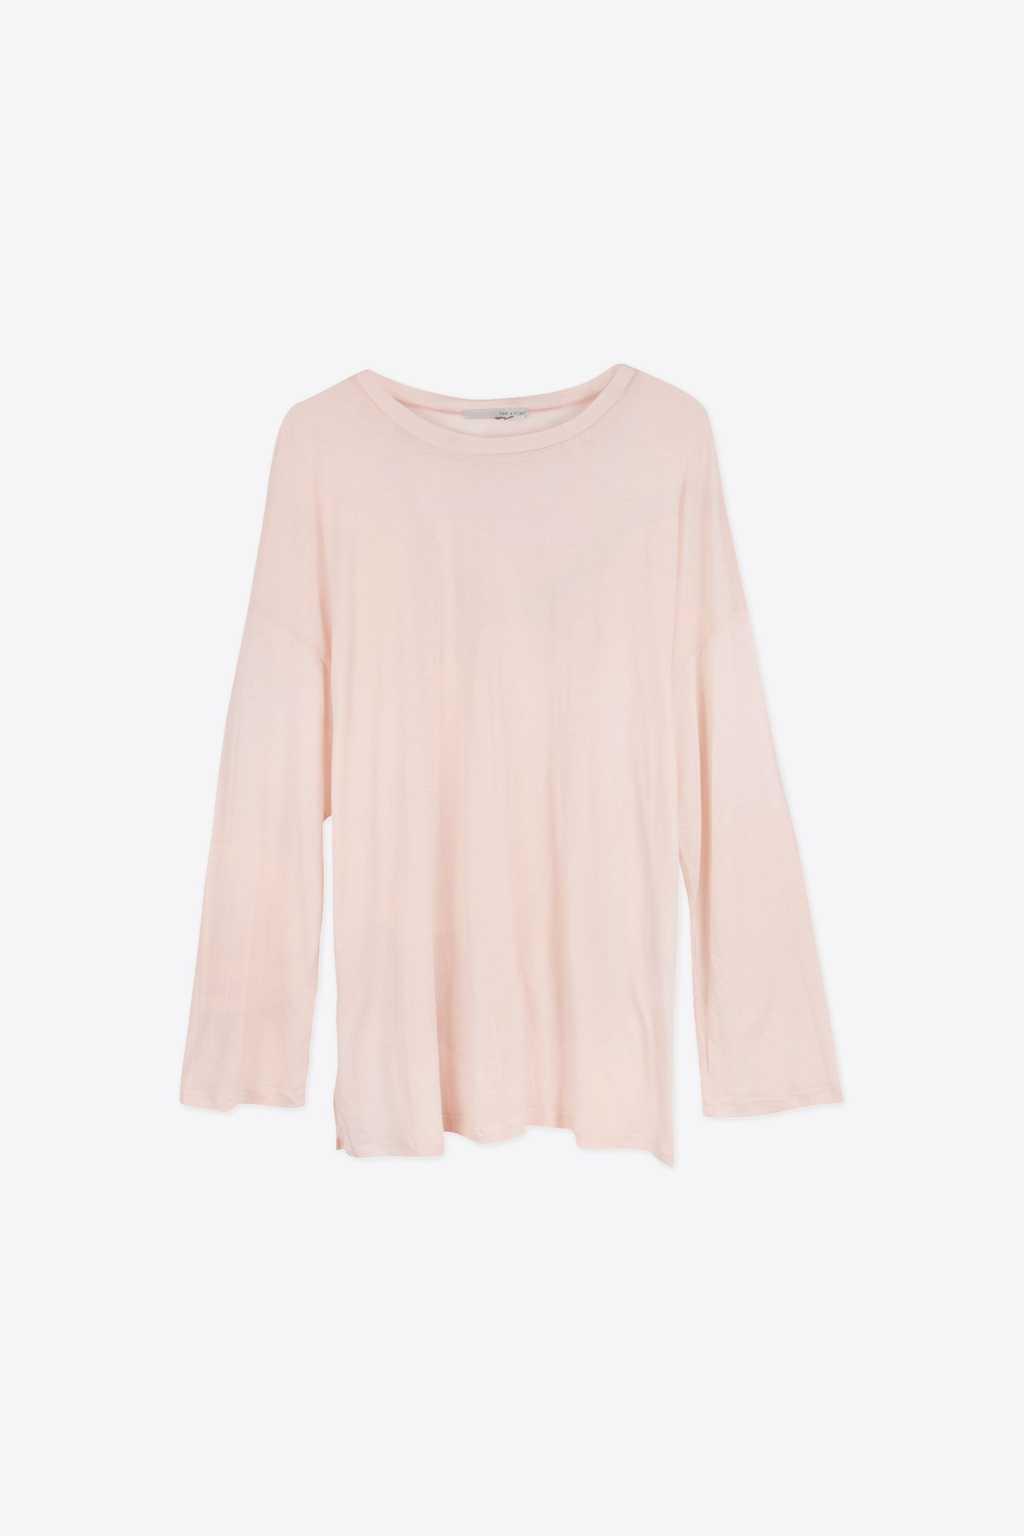 TShirt H238 Pink 5